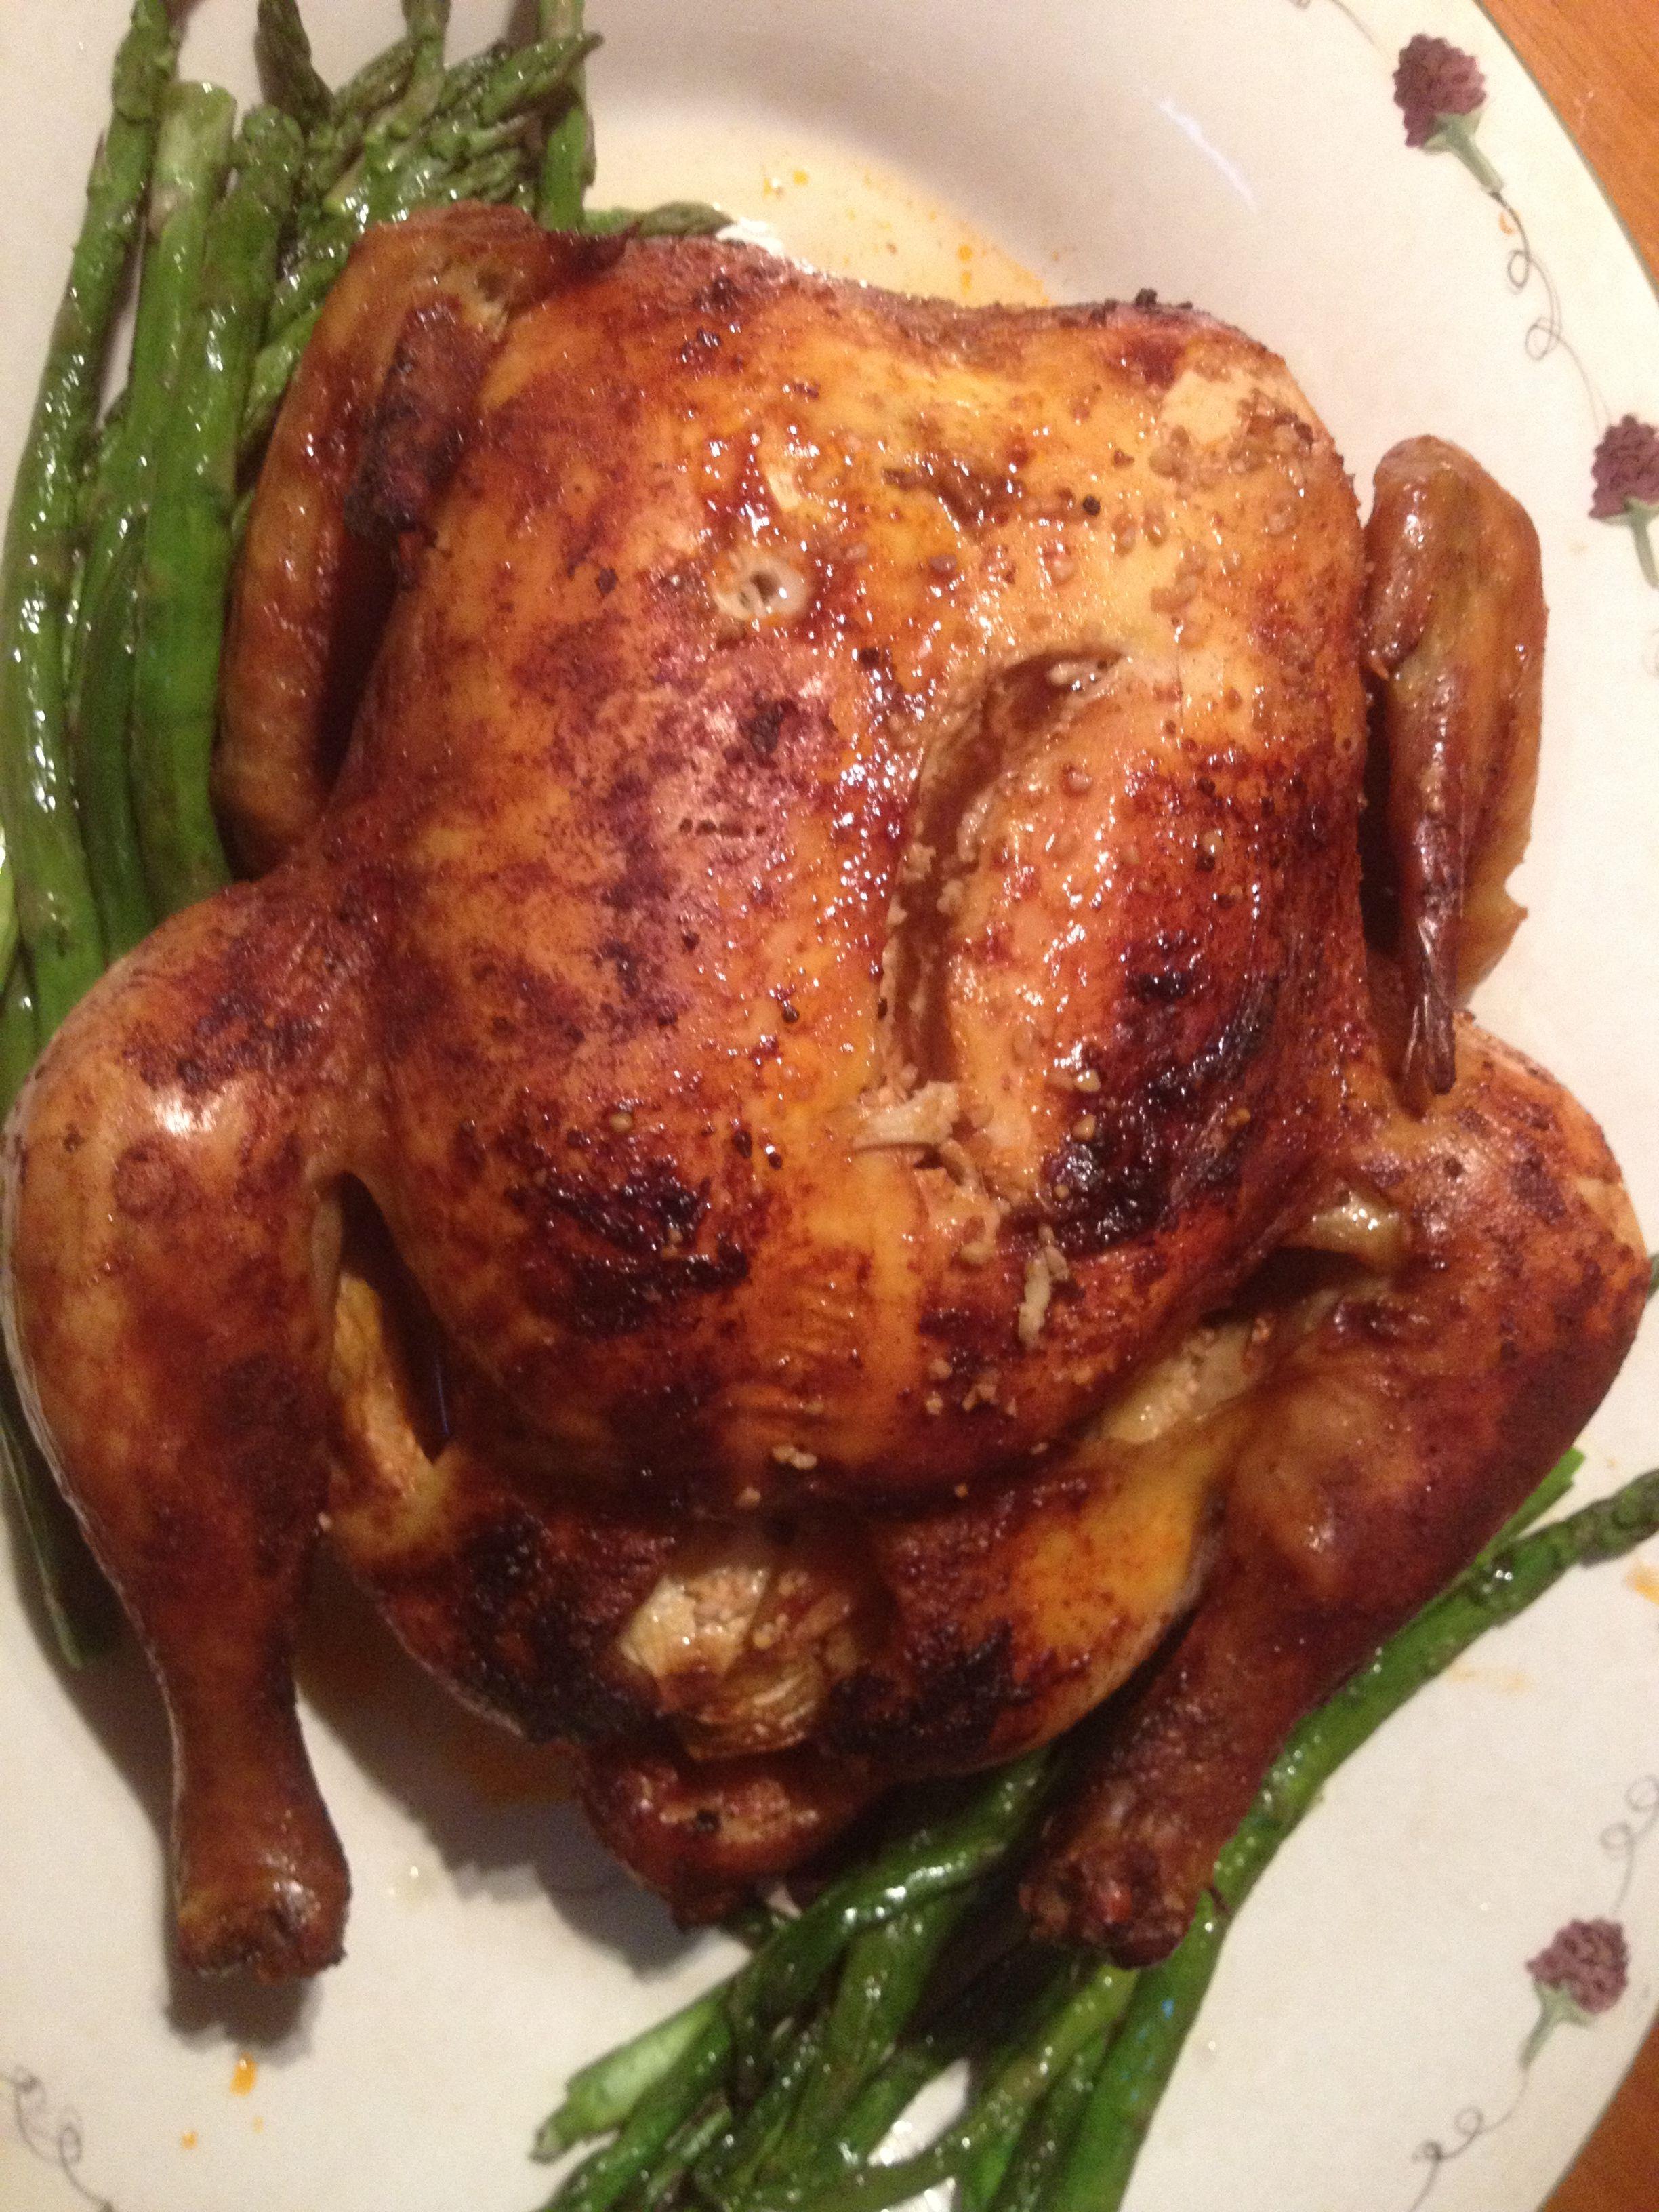 Jamaican Style Roasted Chicken Healthy Chicken Recipes Roast Chicken Recipes Jamaican Recipes